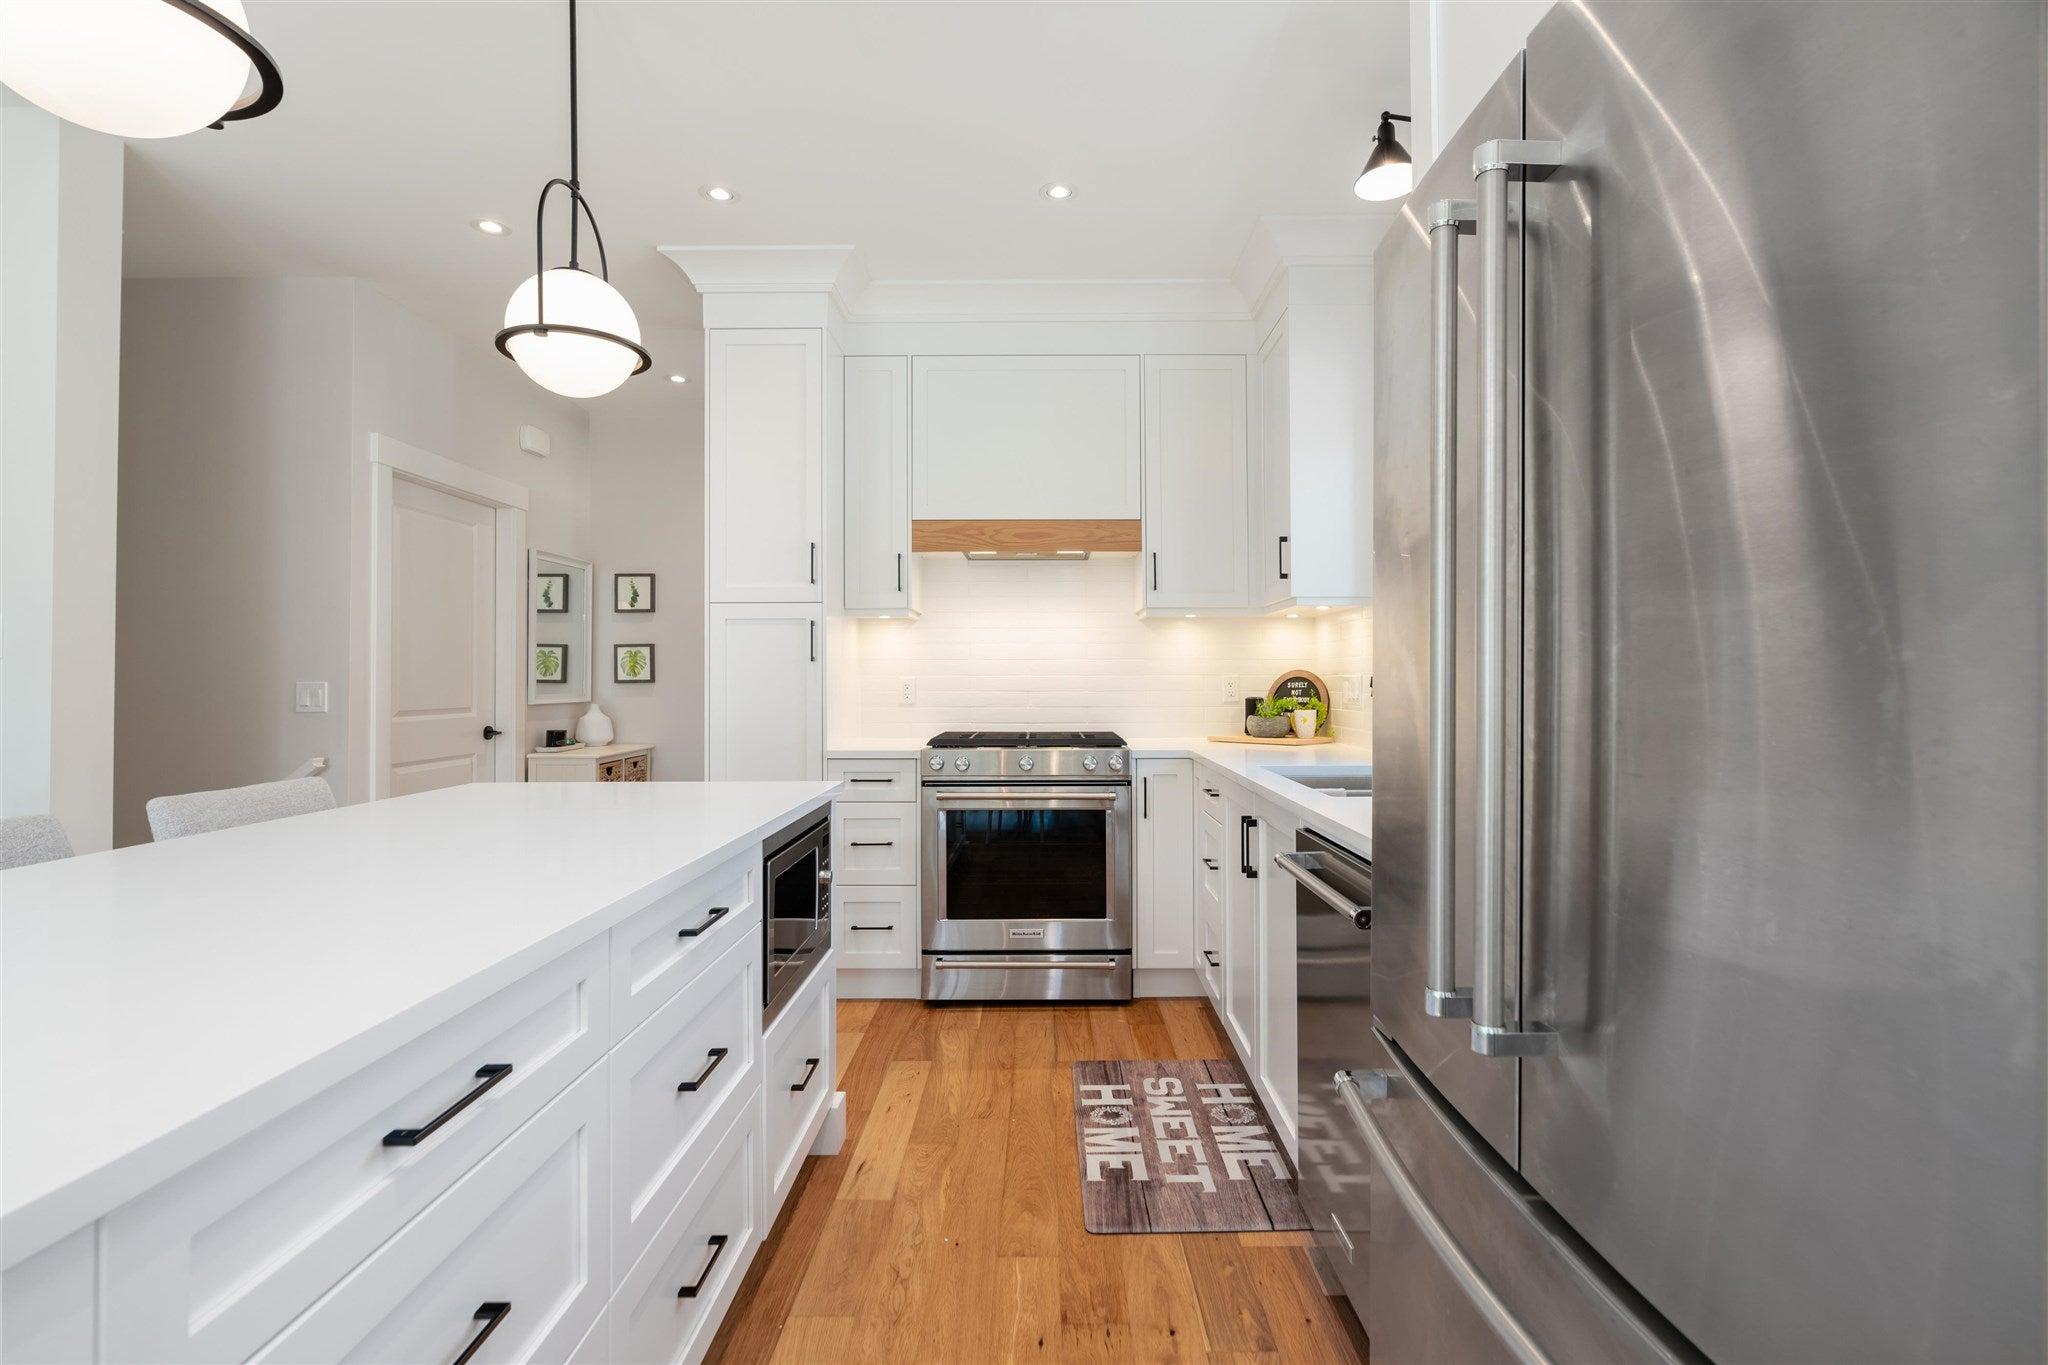 40 21858 47B AVENUE - Murrayville Townhouse for sale, 4 Bedrooms (R2603956) - #12